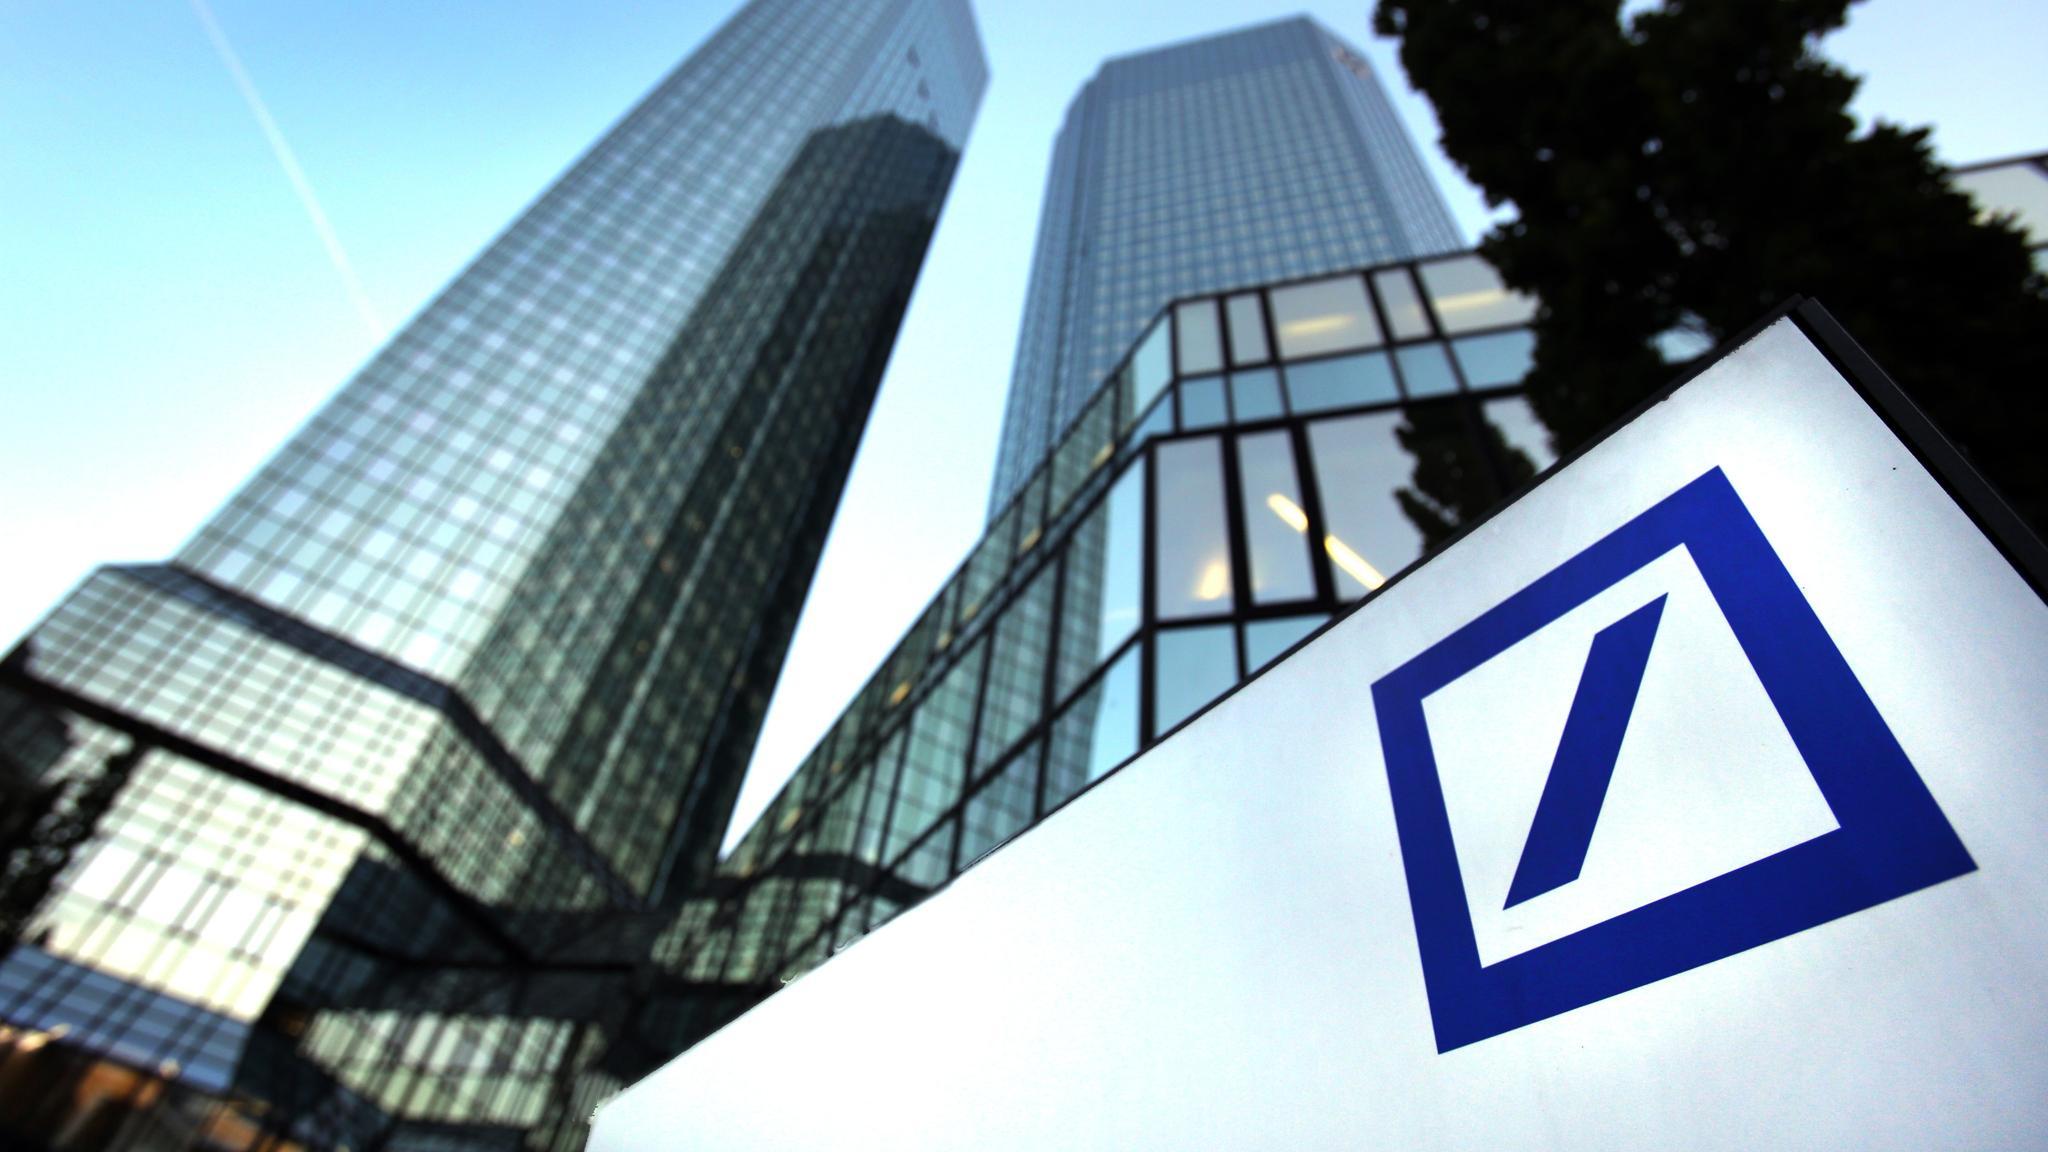 Higher inflation could trigger recession - Deutsche bank